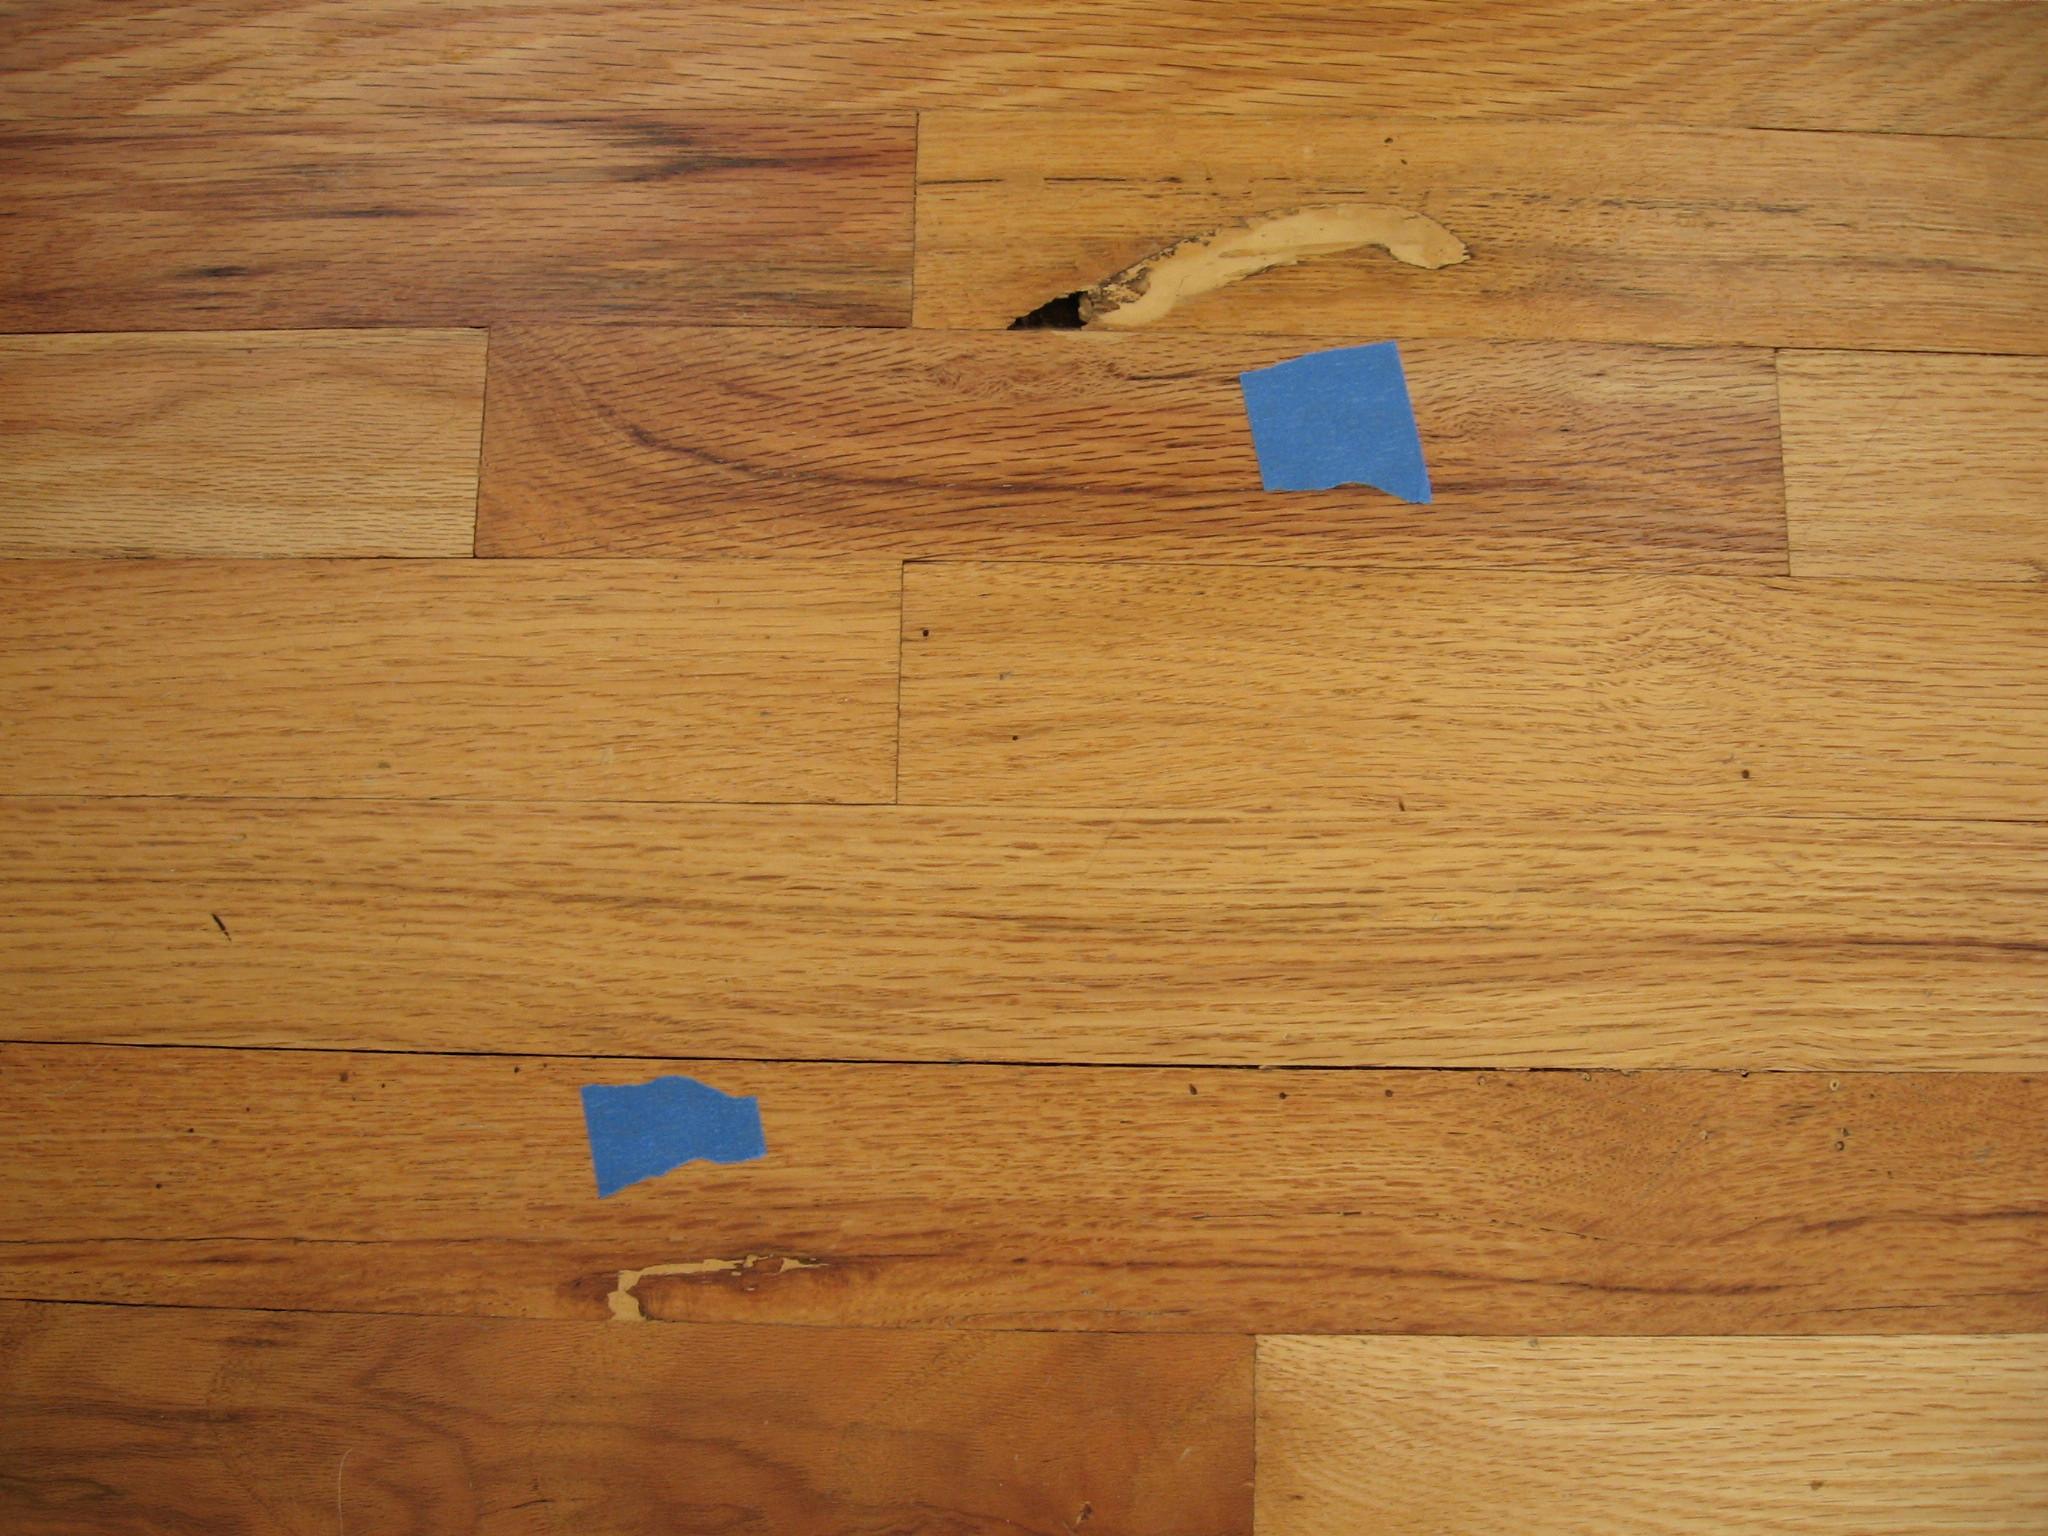 best hardwood floor cleaner canada of hardwood floor installation archives wlcu inside hardwood floor repair near me best of wood floor techniques 101 category floor tags hardwood floor cleaner